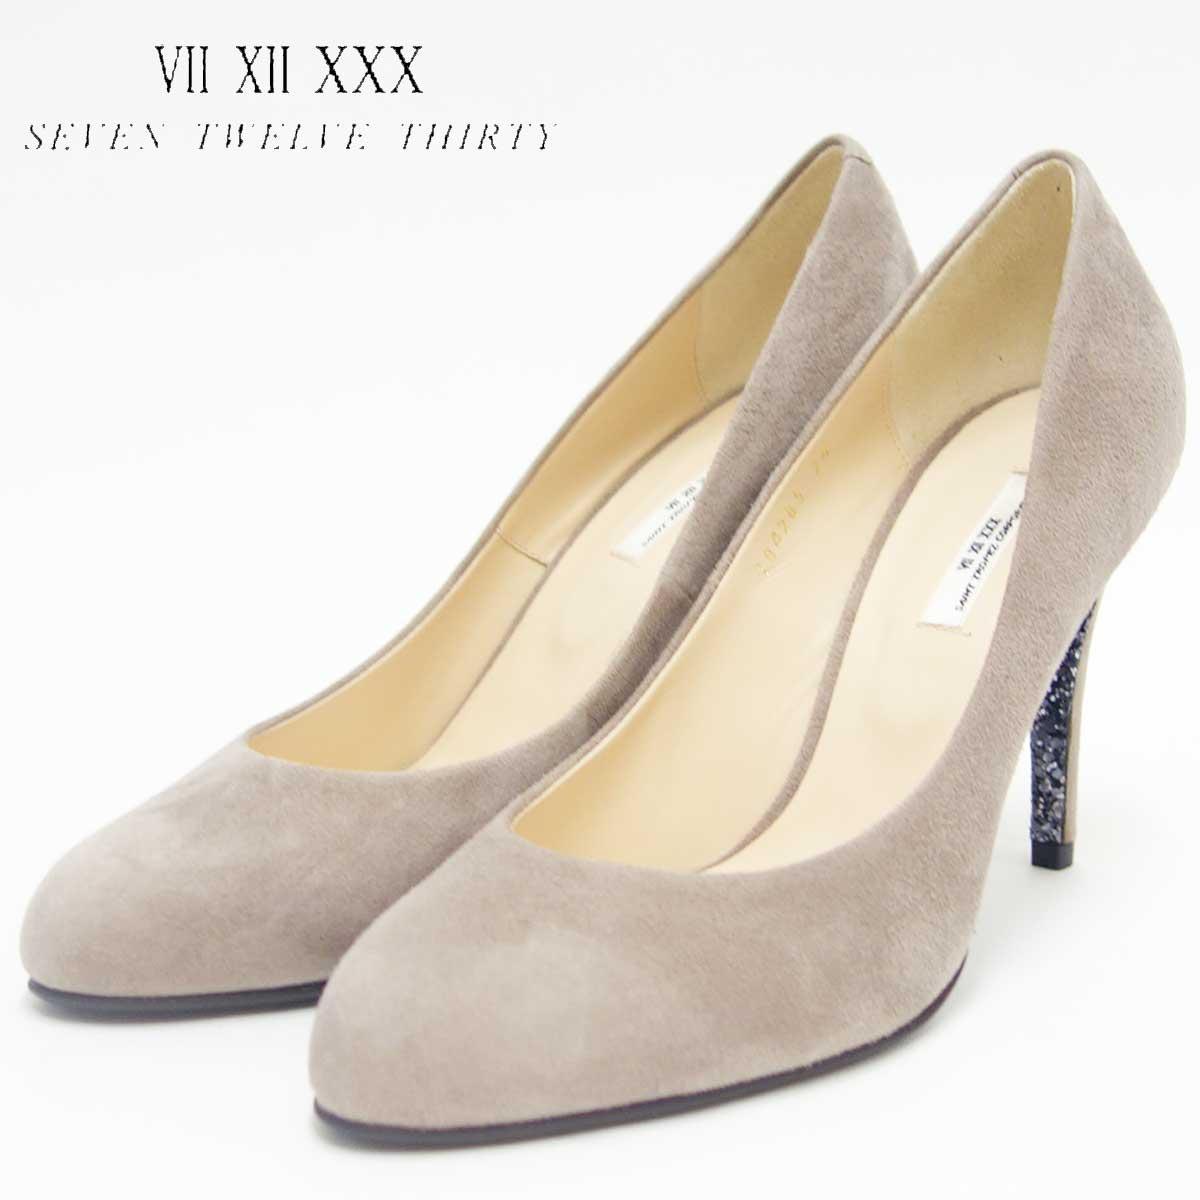 SEVEN TWELVE THIRTY セヴントゥエルヴサーティ 104285 オークスエード (9cmヒール)グリッターソールパンプス(日本製)「靴」